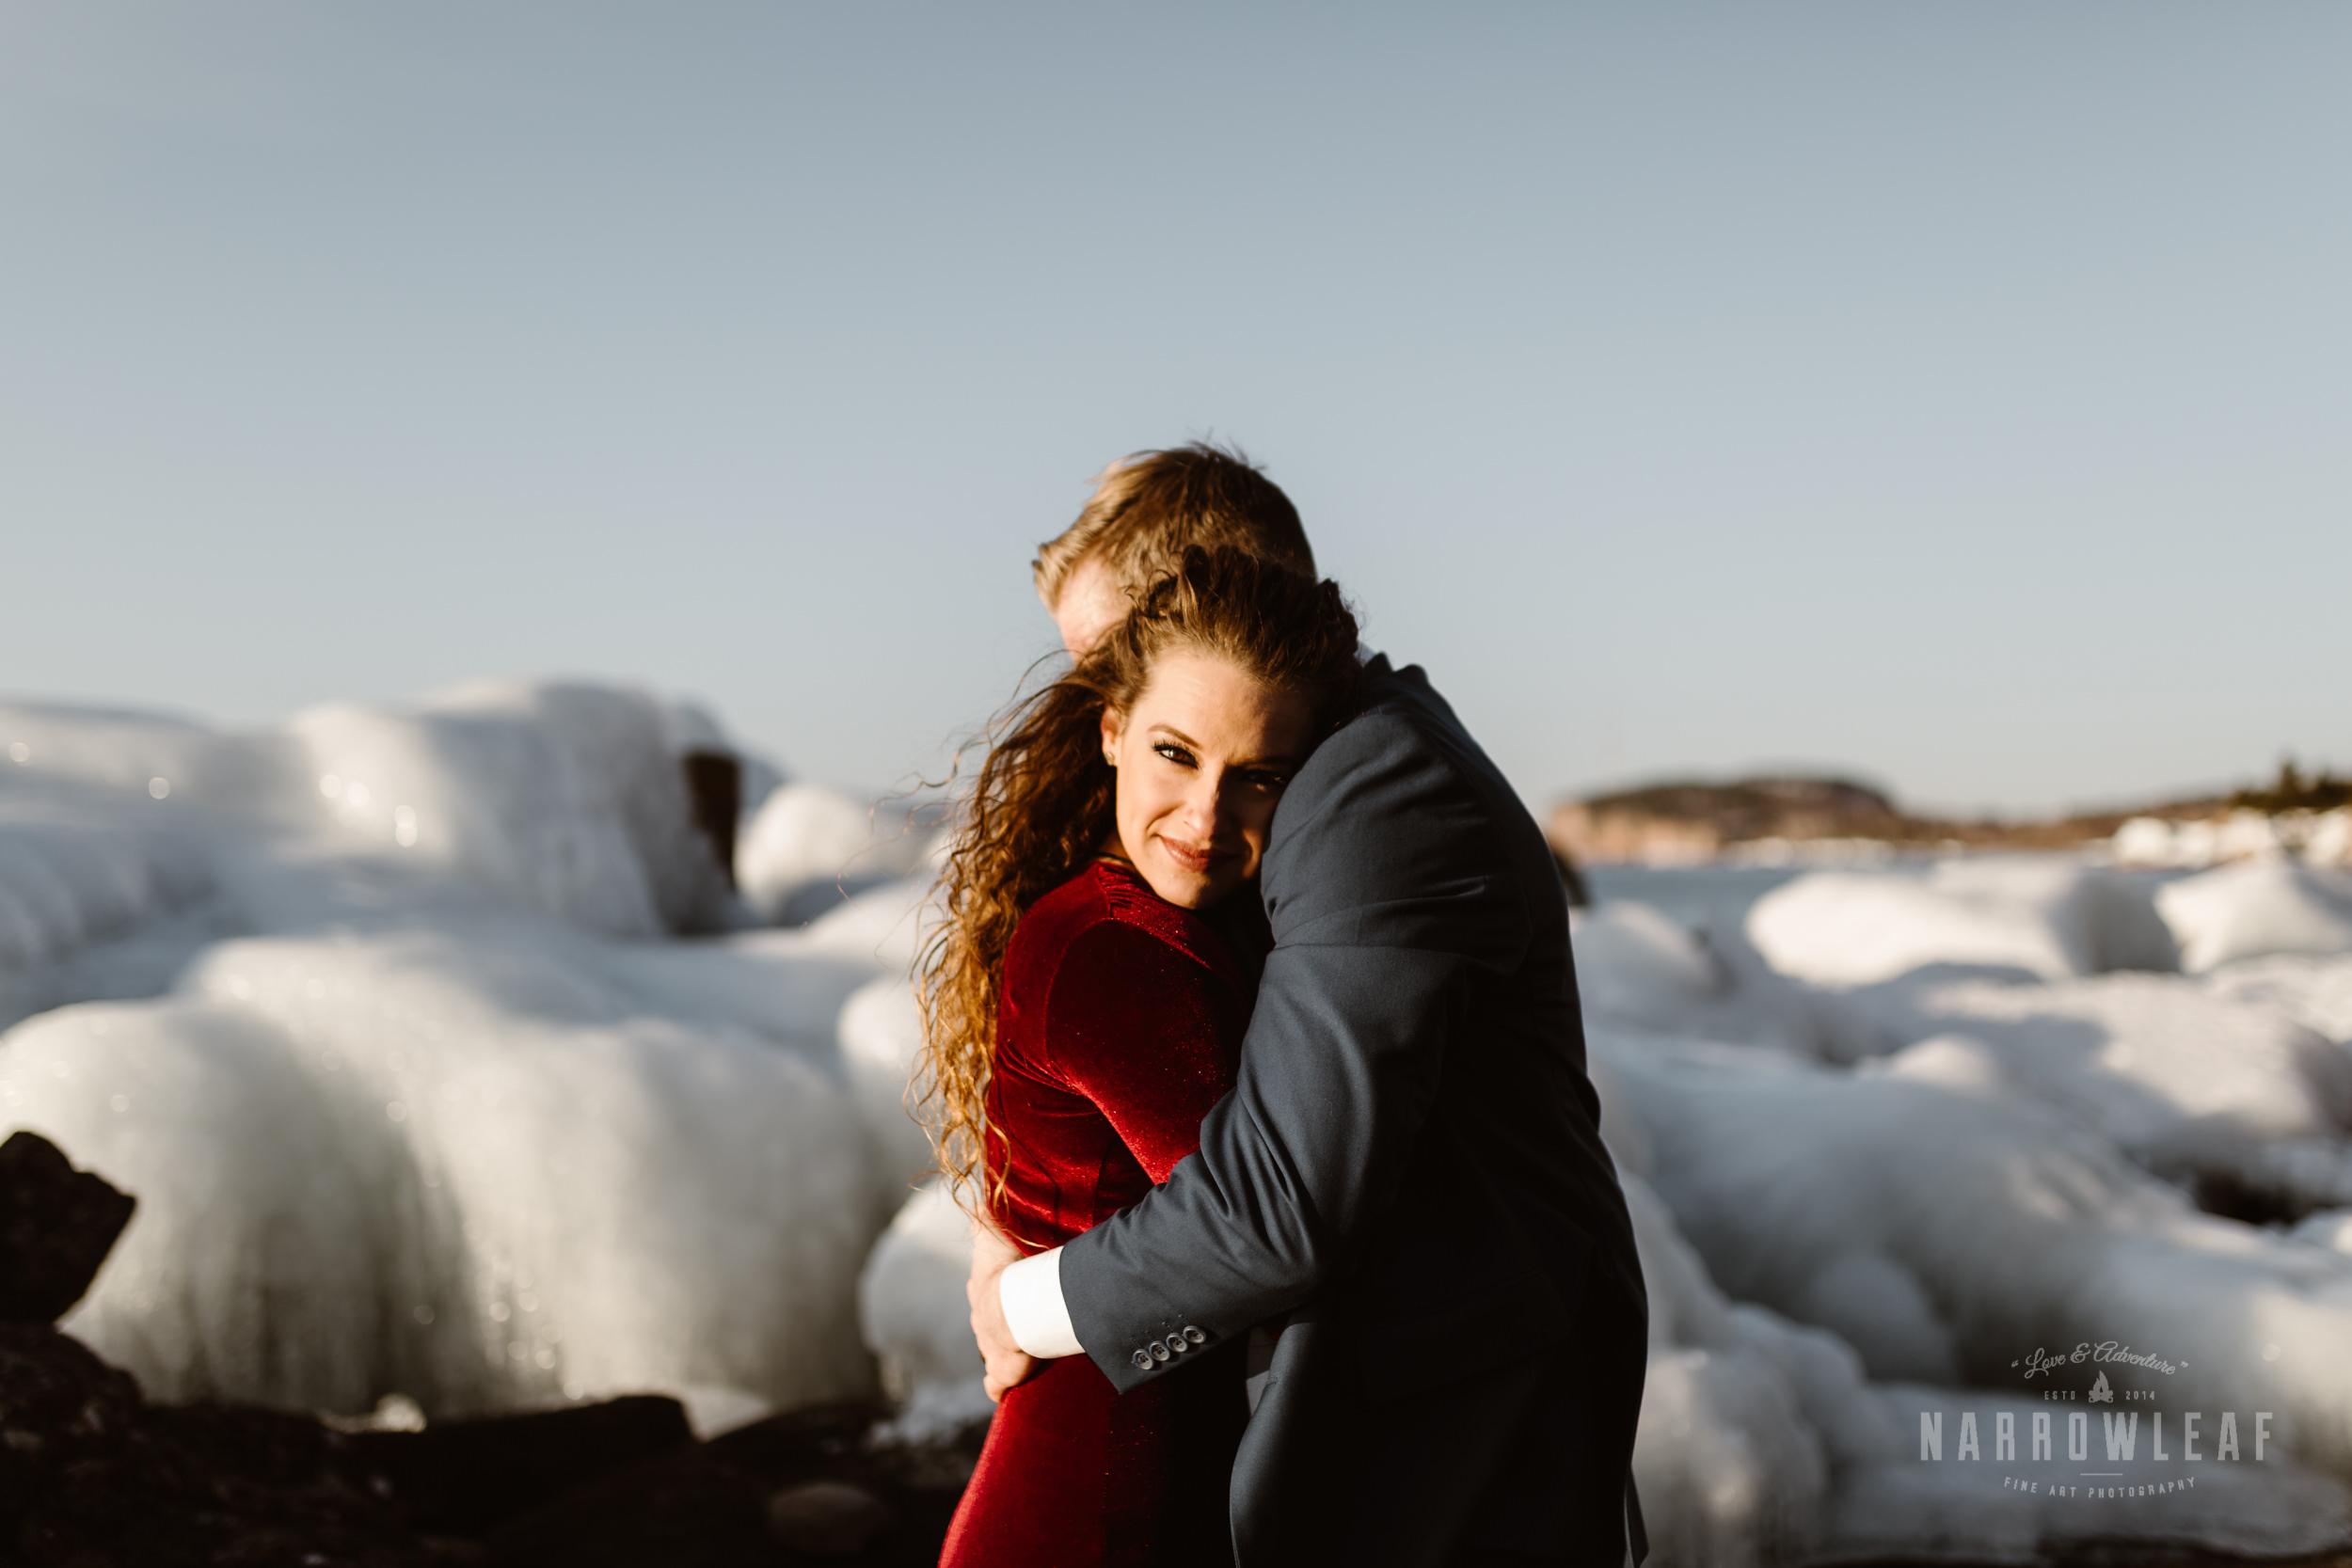 winter-adventure-elopement-tettegouche-state-park-minnesota-Narrowleaf_Love_and_Adventure_Photography-8739.jpg